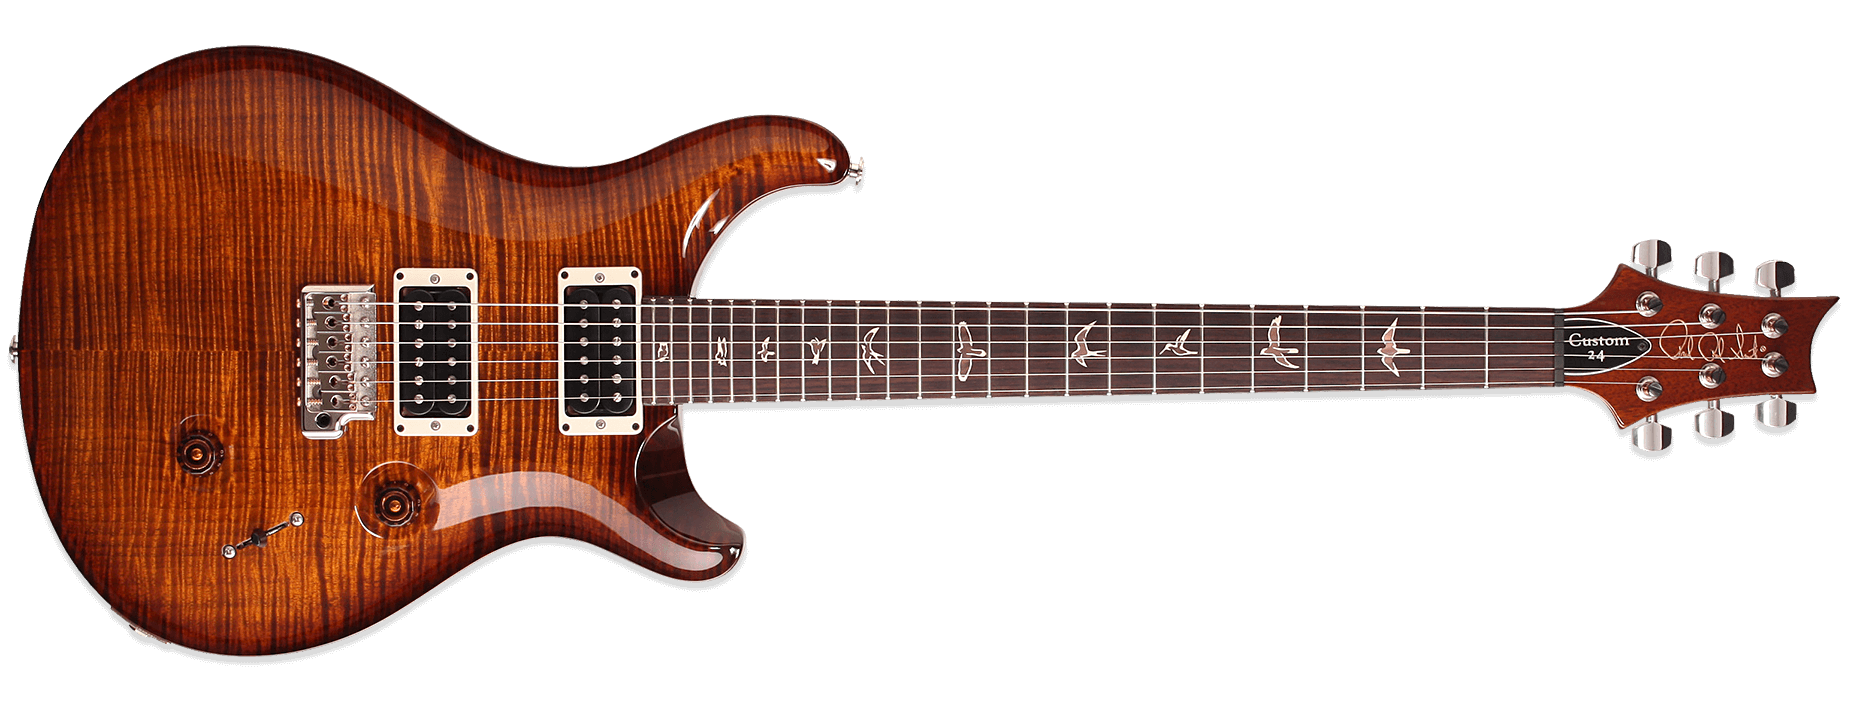 PRS 2011 Custom 24 10-Top